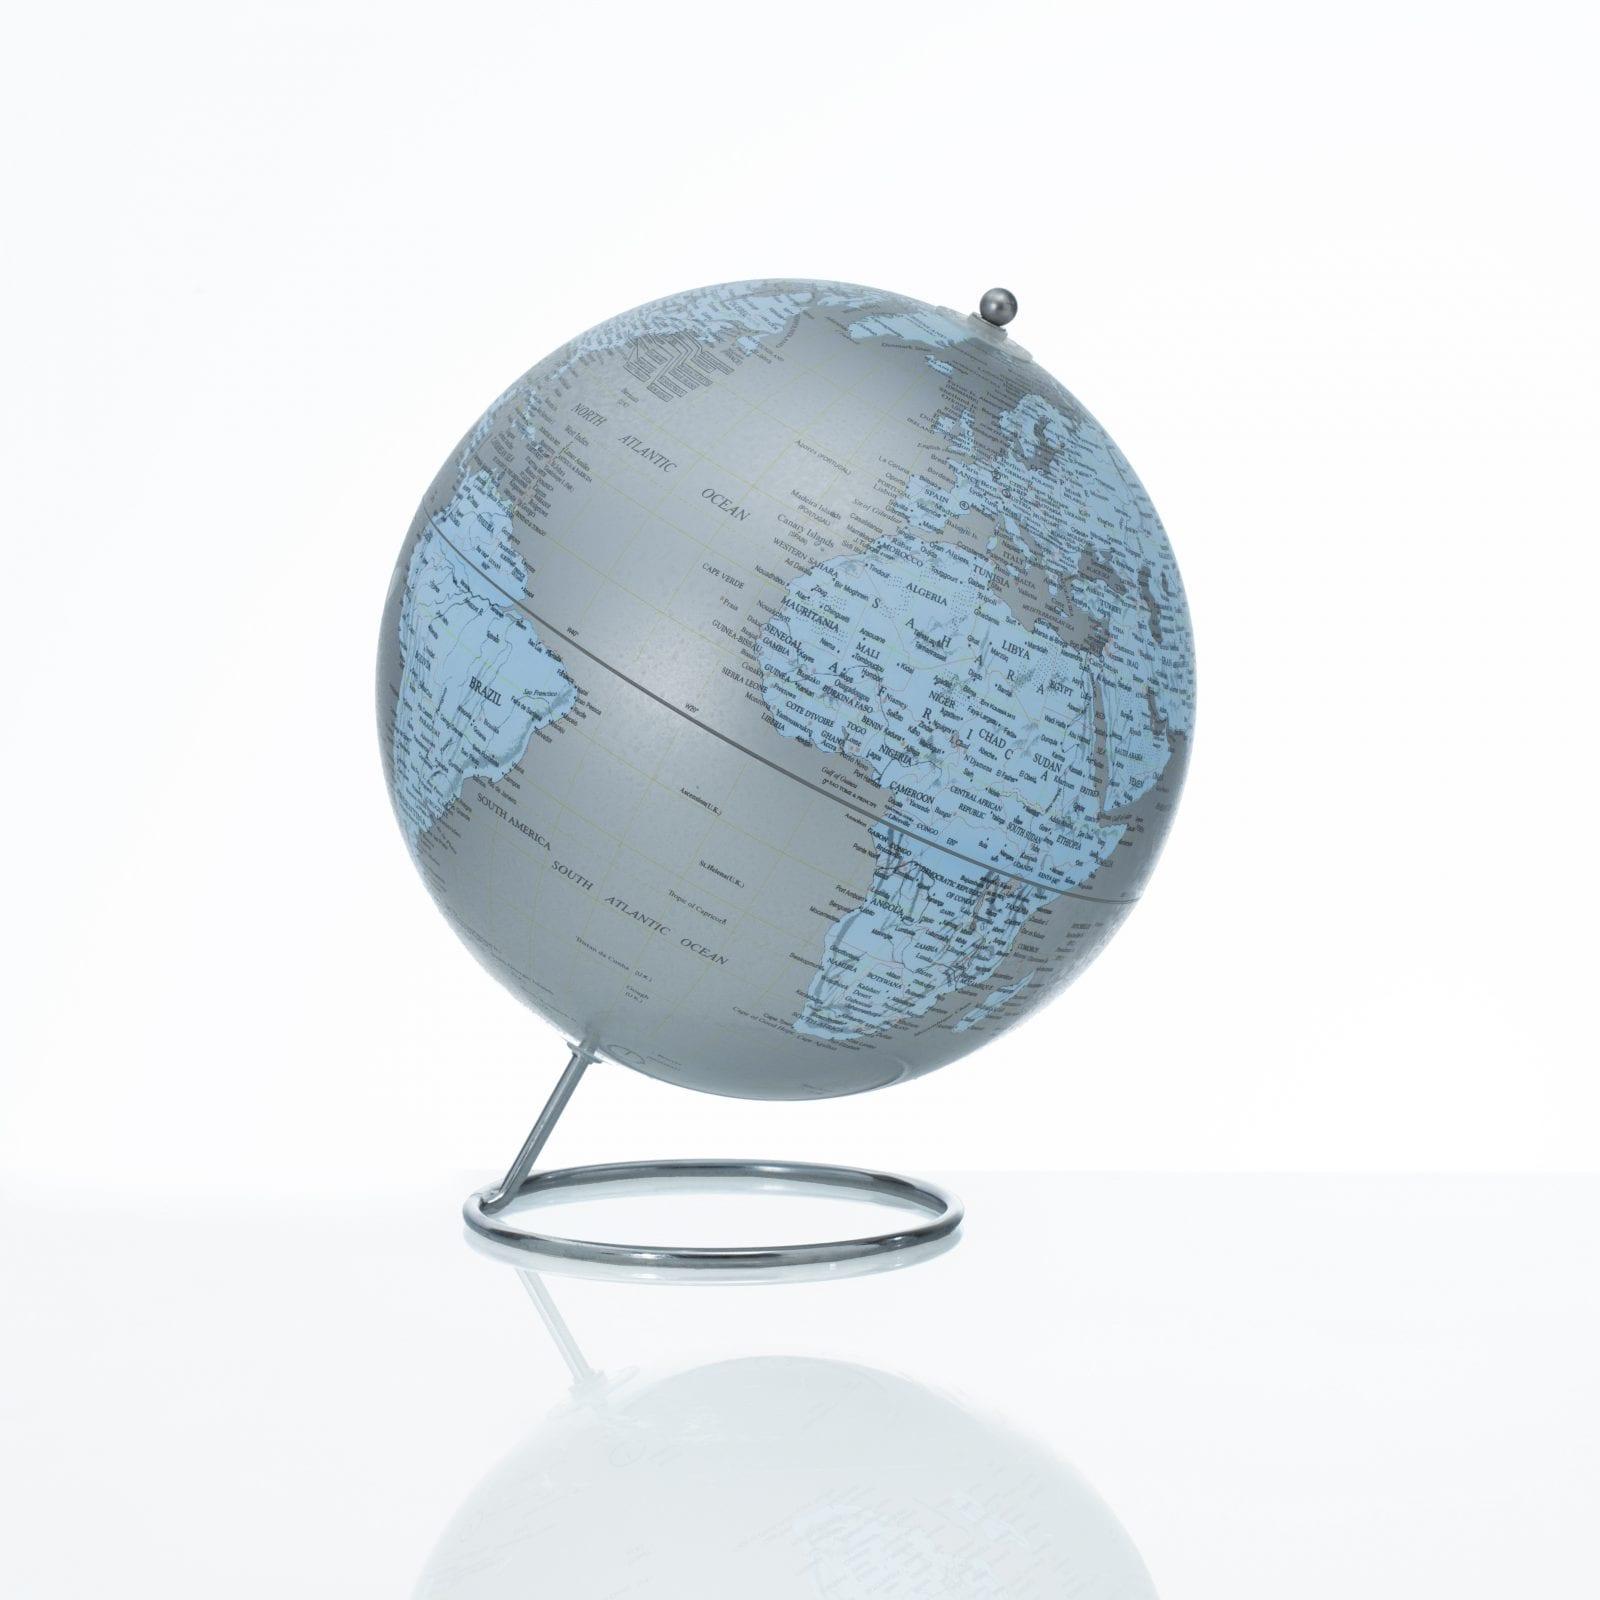 Dekorativni Globus Earth O 25x30cm Modry Bonder